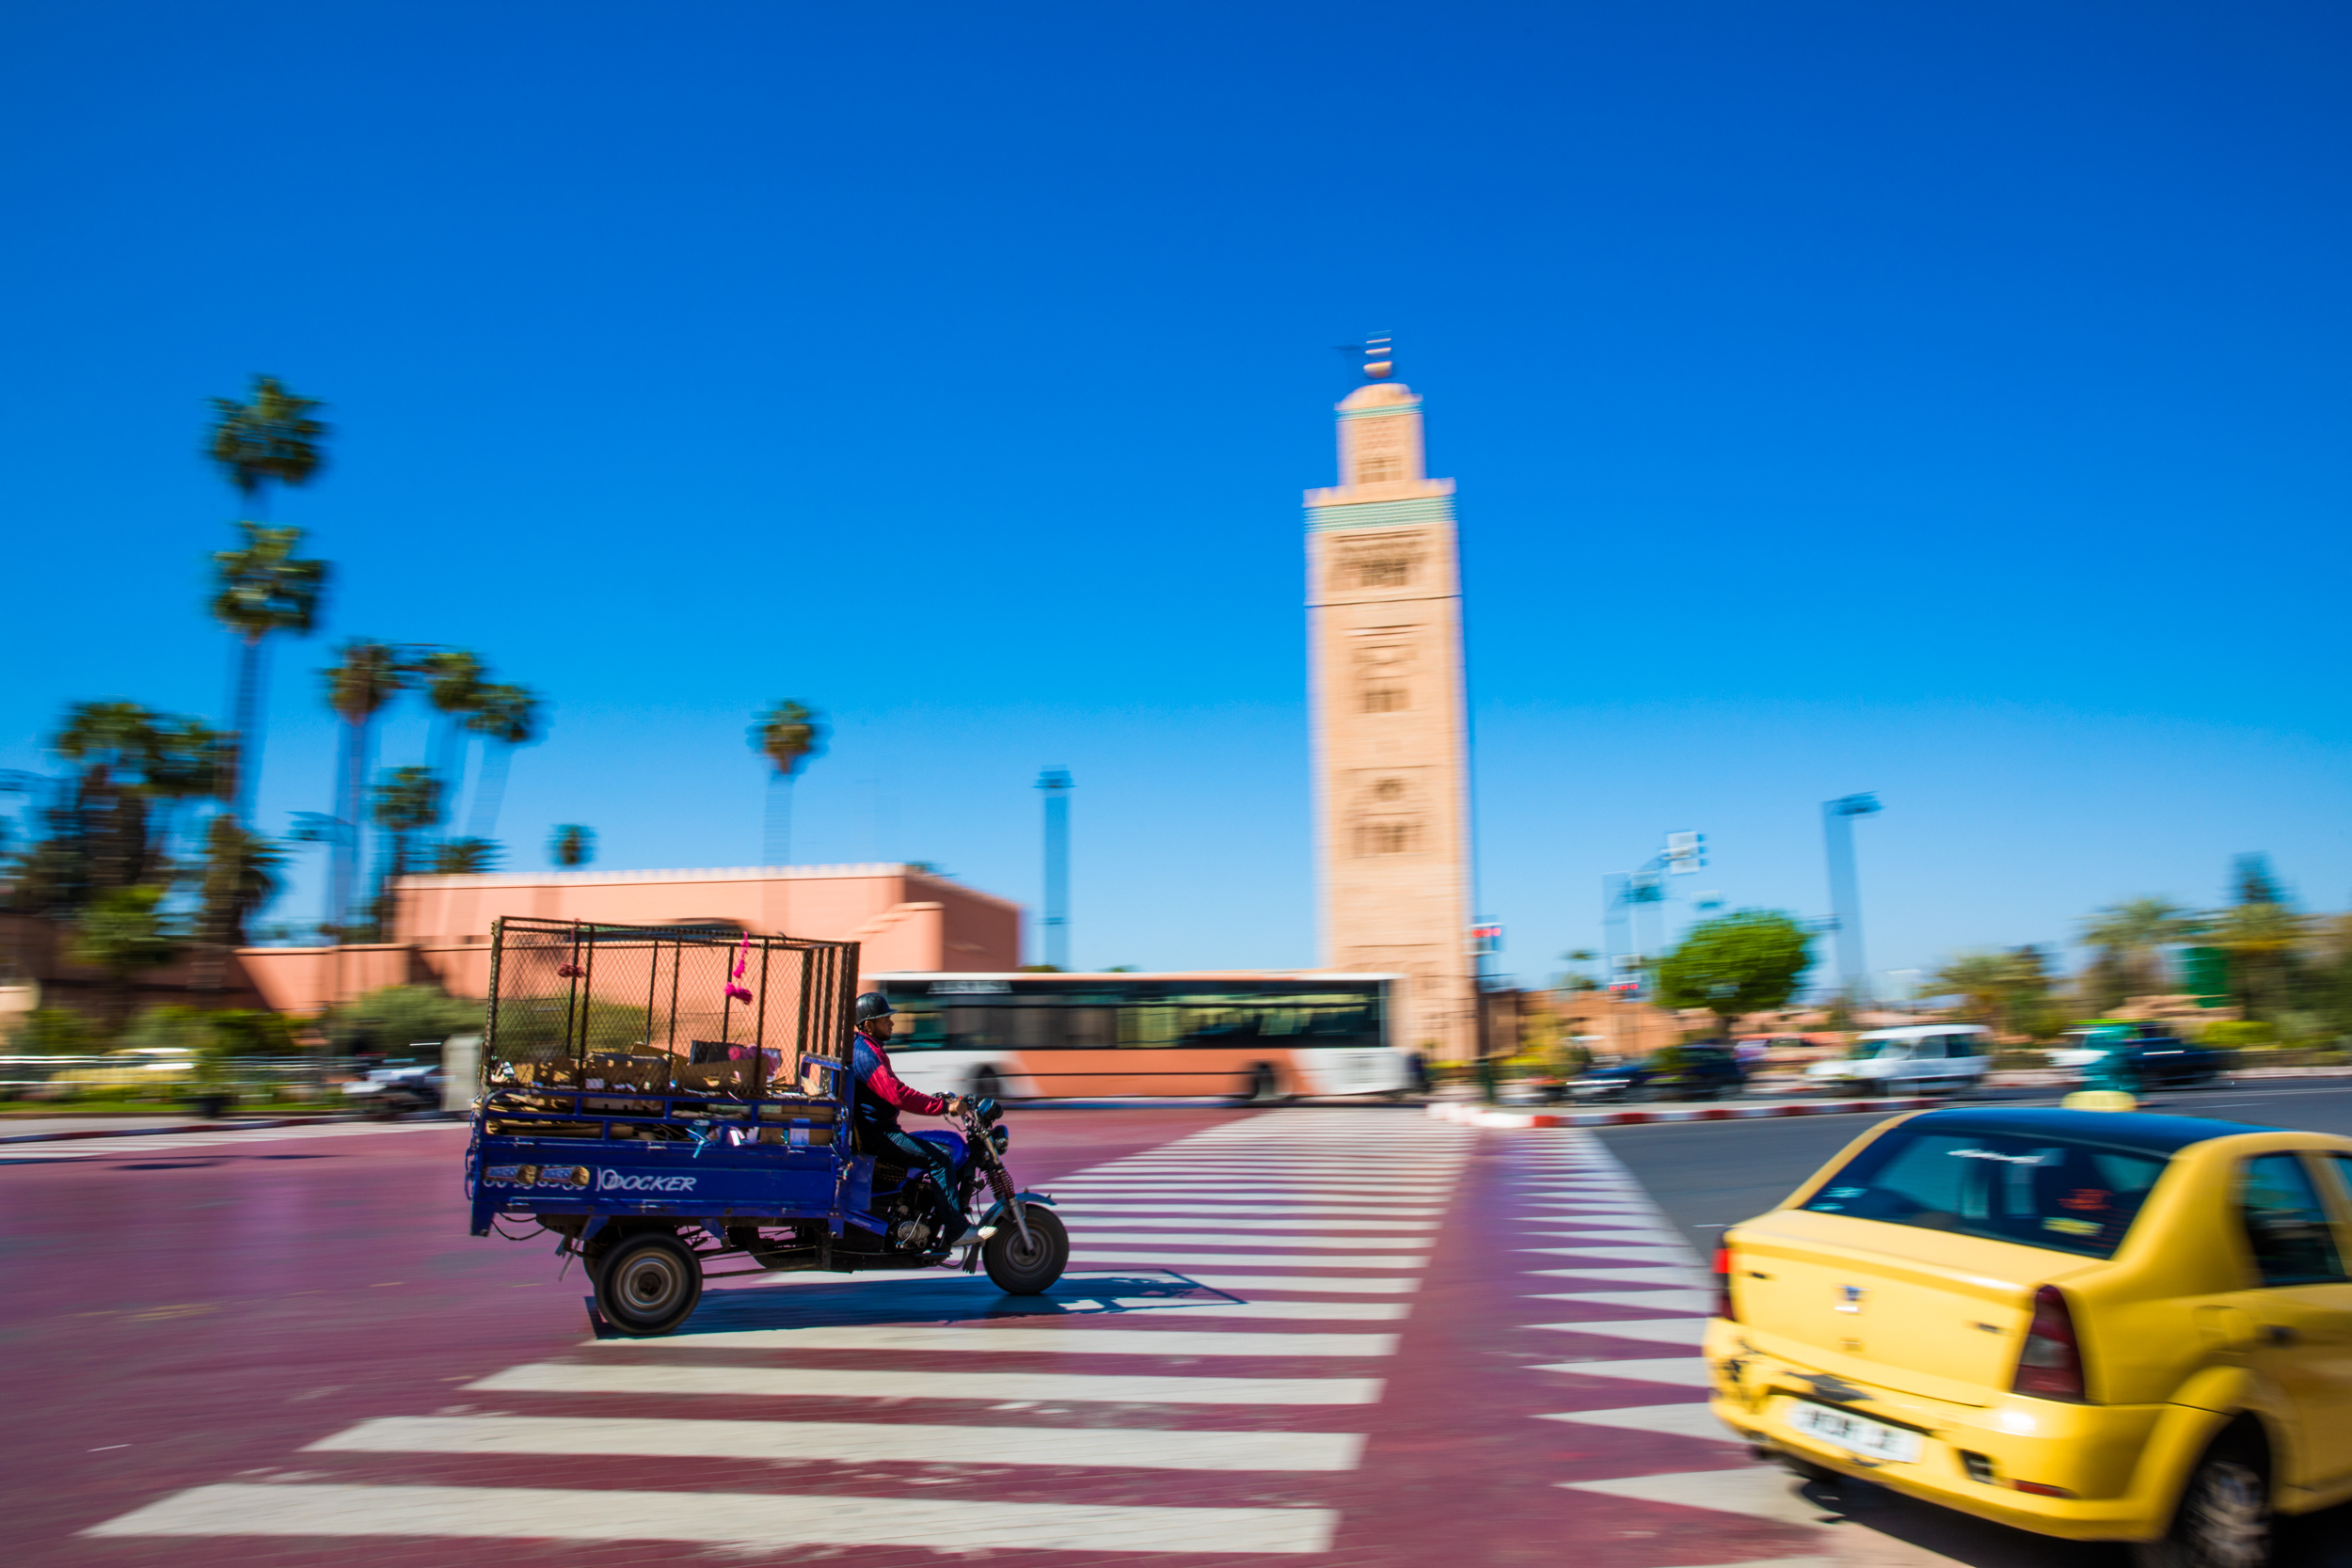 Colin_Herrington_Maroc_Stories-9.jpg